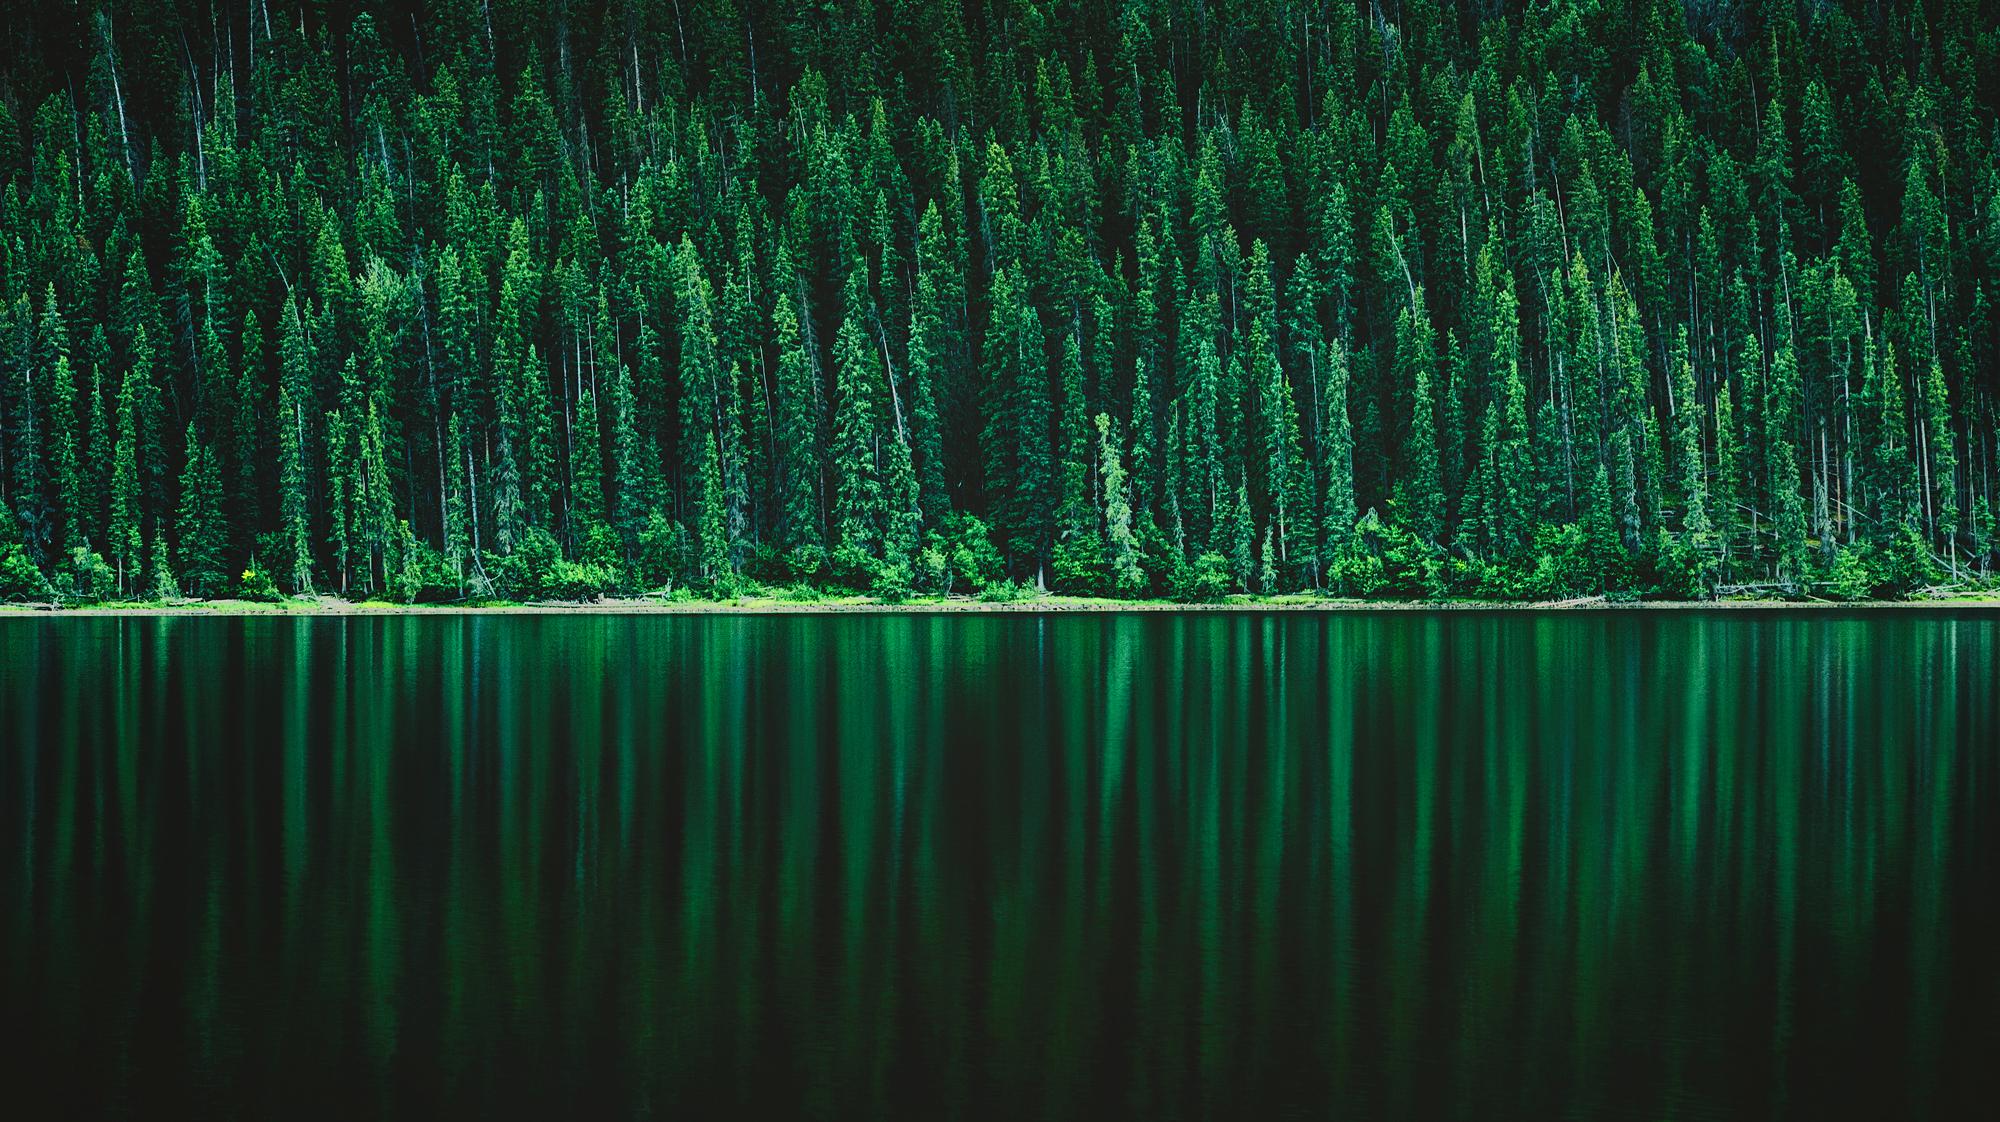 Atmospherics_Emerald_Refelctions_2000px.jpg